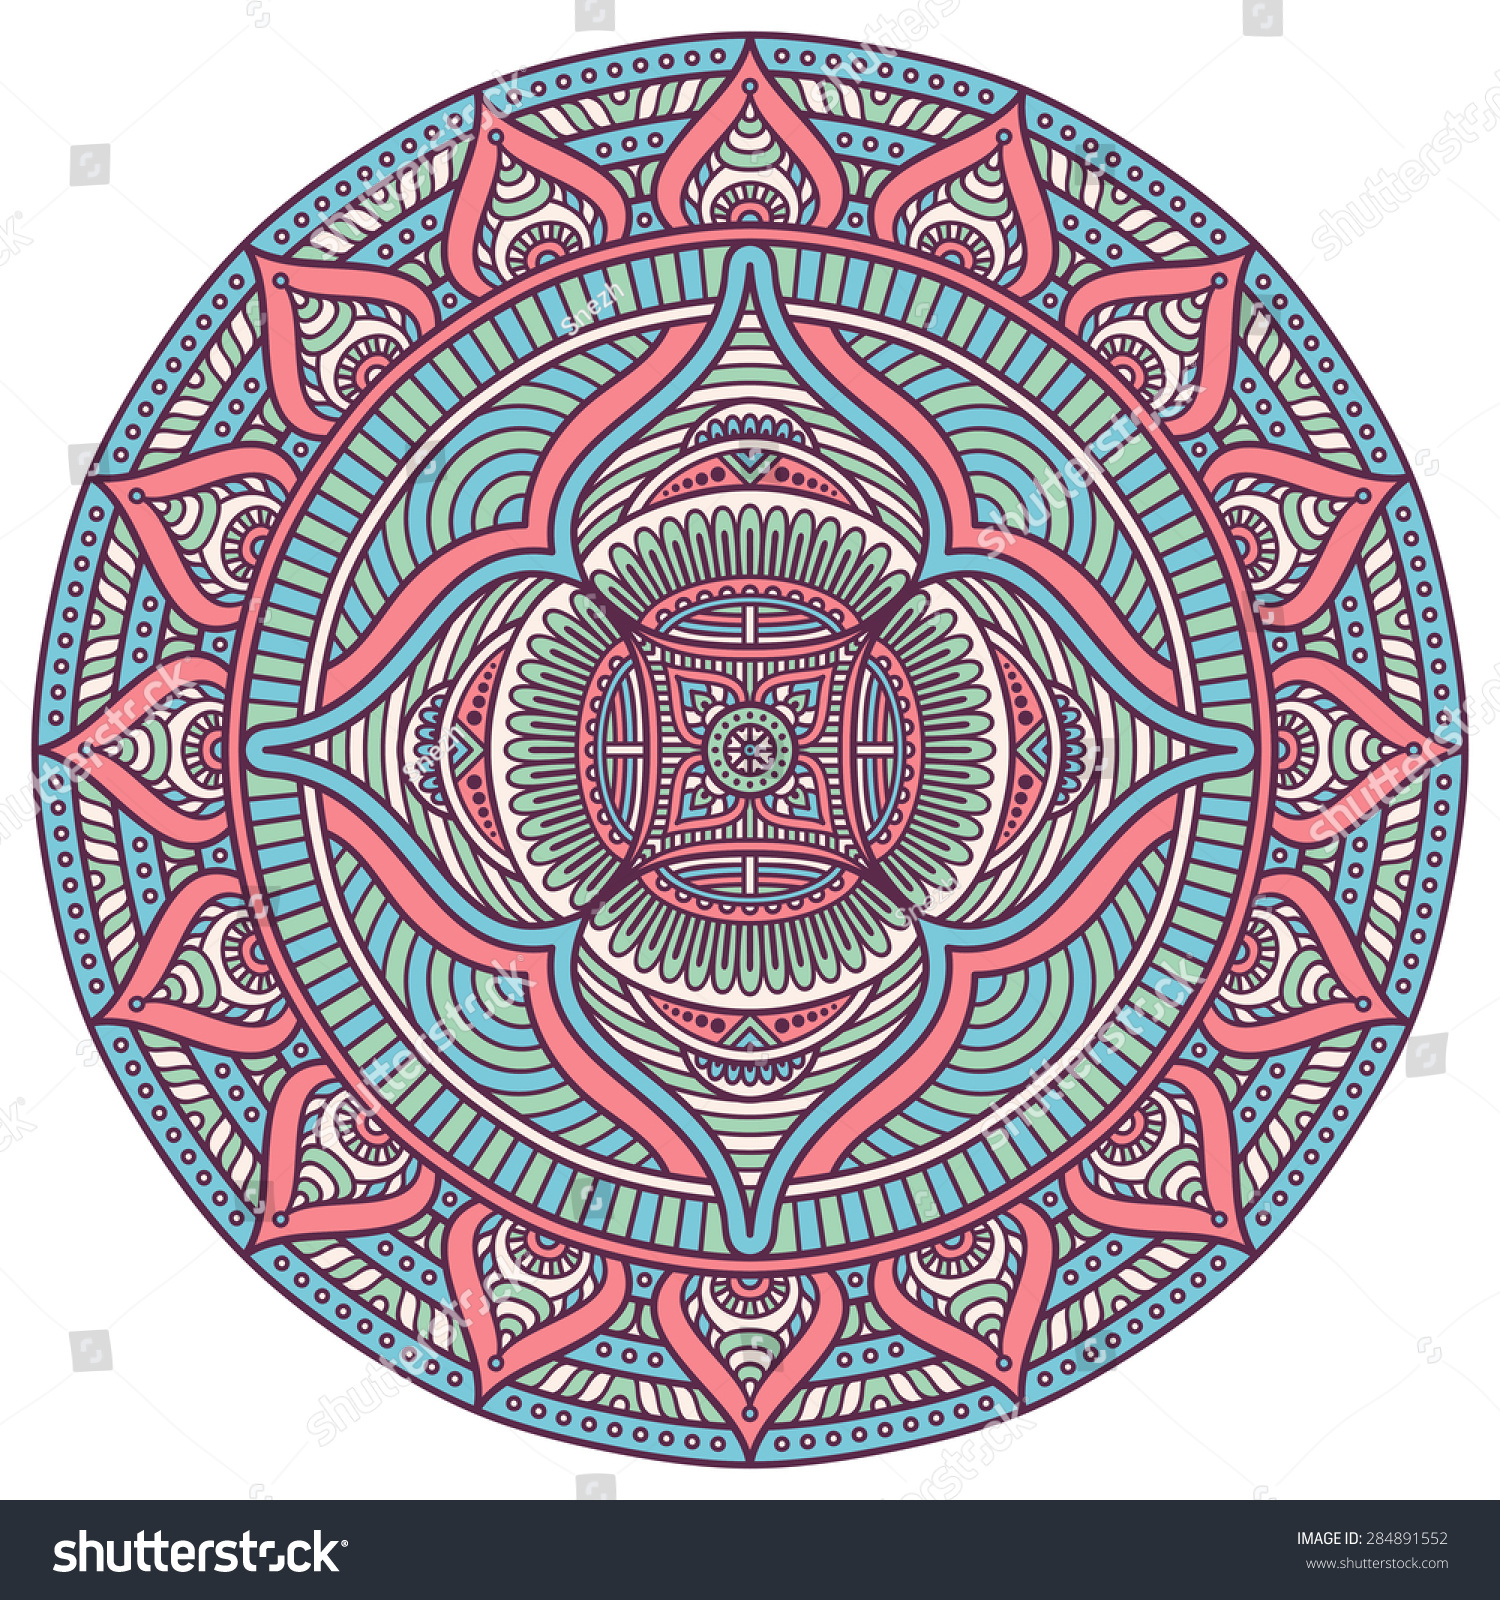 Mandala. Vintage decorative elements. Hand drawn background. Islam ...